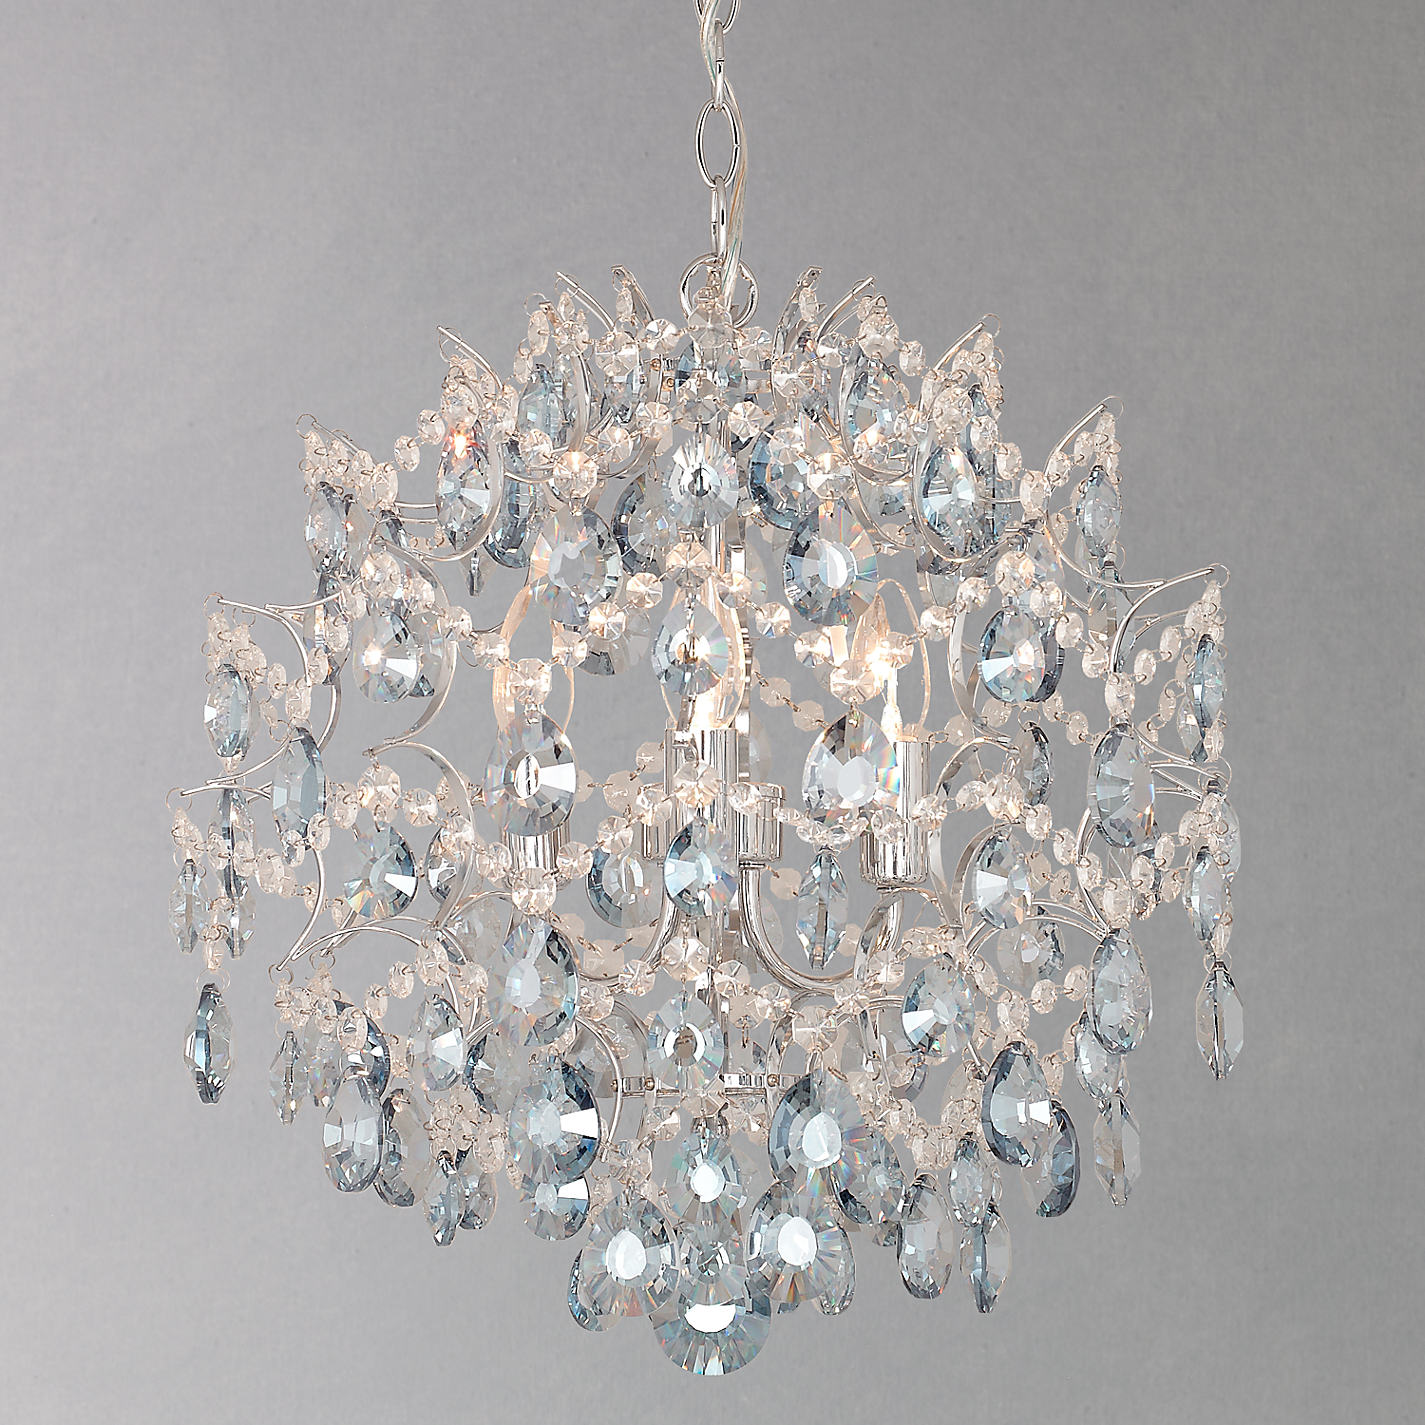 Buy john lewis baroque crystal chandelier john lewis buy john lewis baroque crystal chandelier online at johnlewis mozeypictures Images